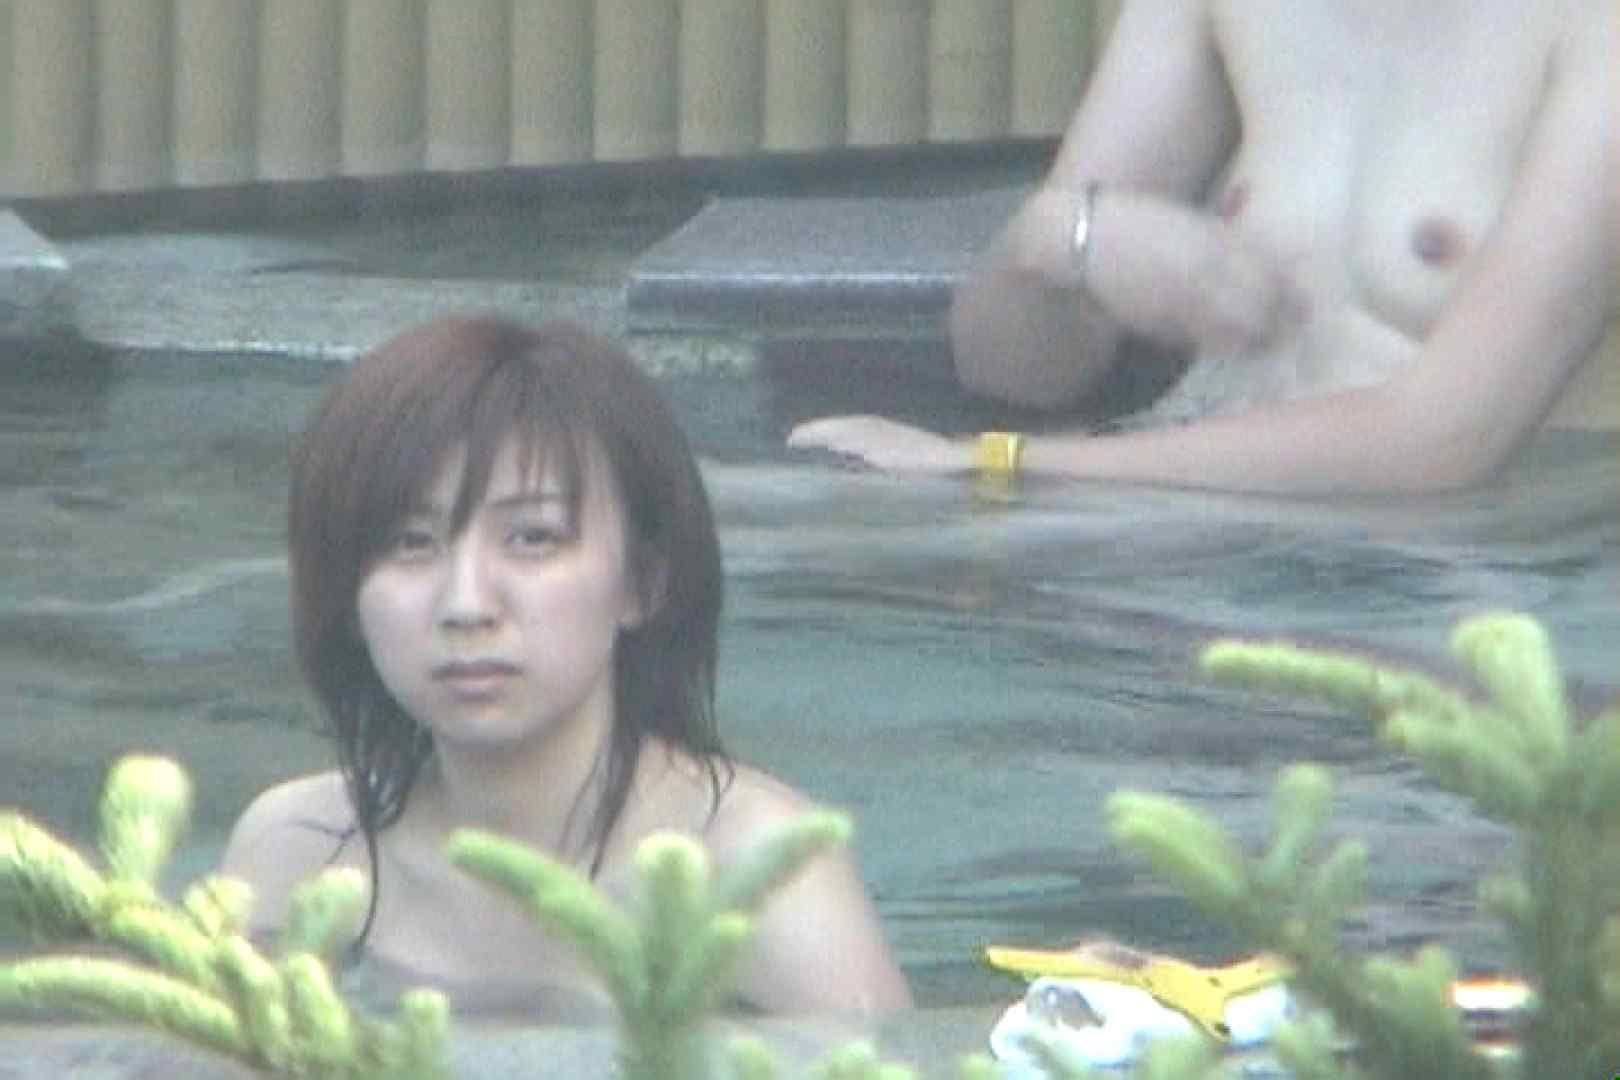 Aquaな露天風呂Vol.77【VIP限定】 露天風呂編  100PIX 92